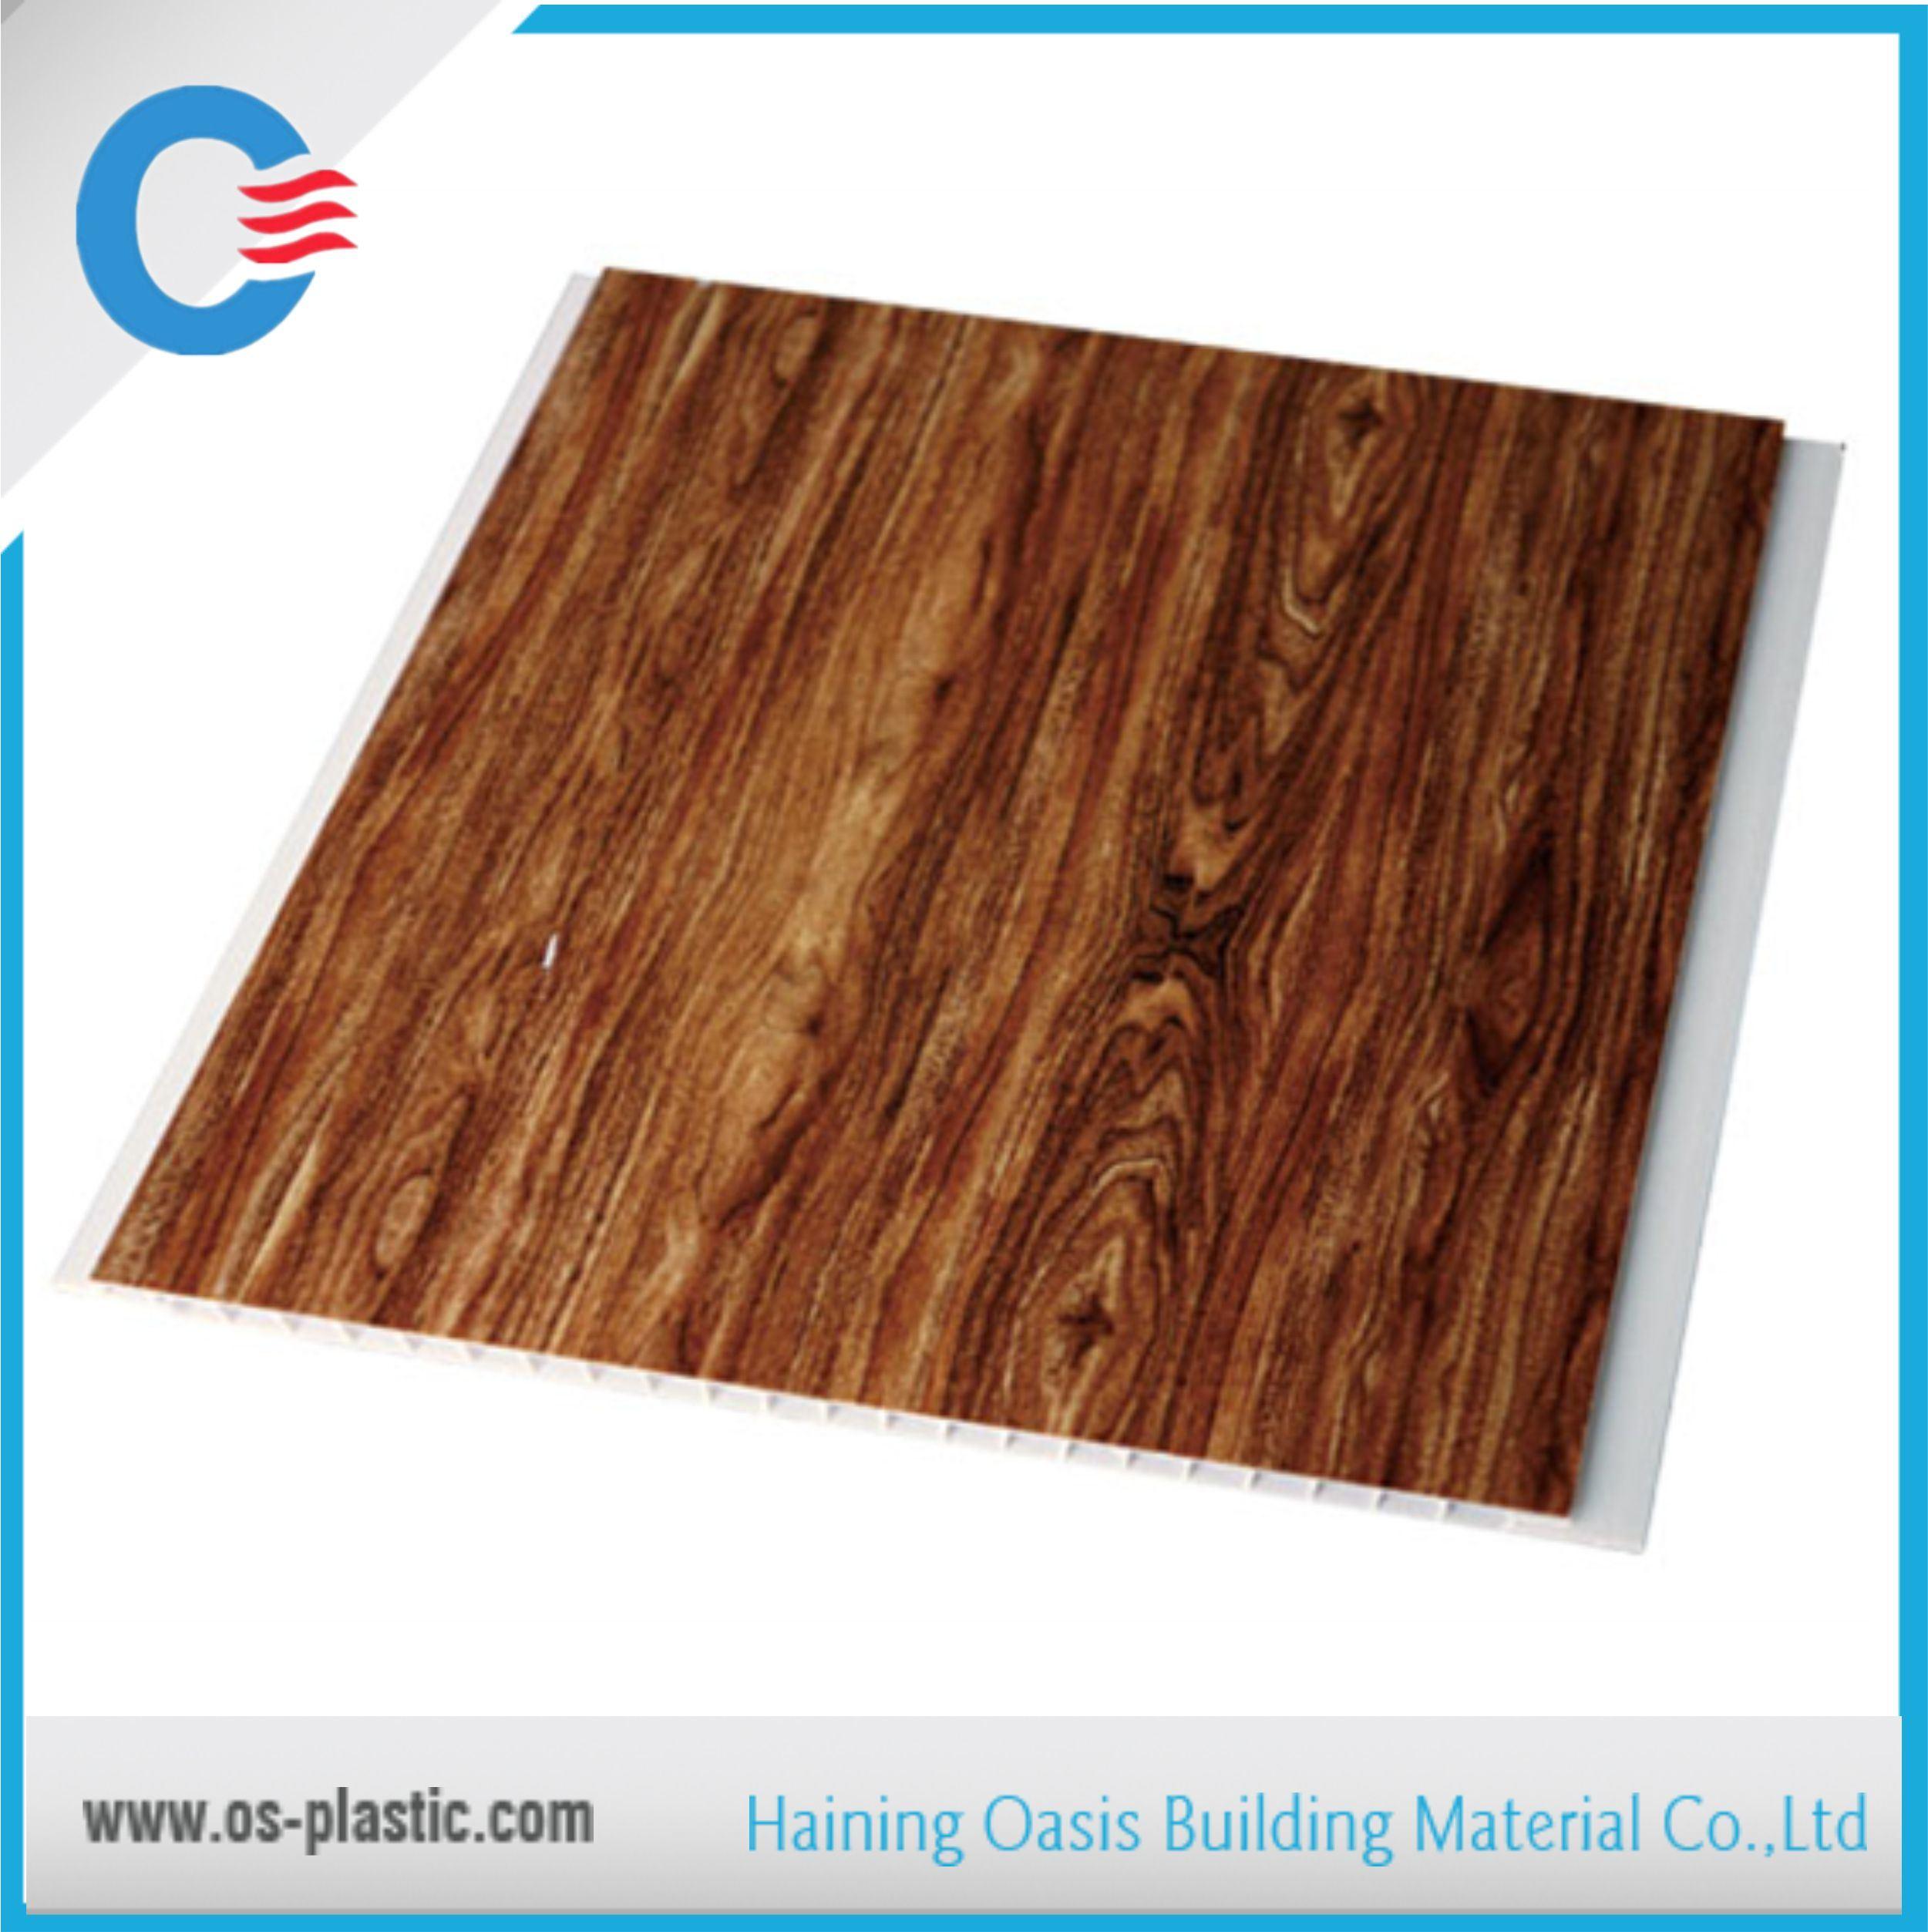 PVC Laminated Wall Panel PVC Ceiling Panels Interior Decorative Board